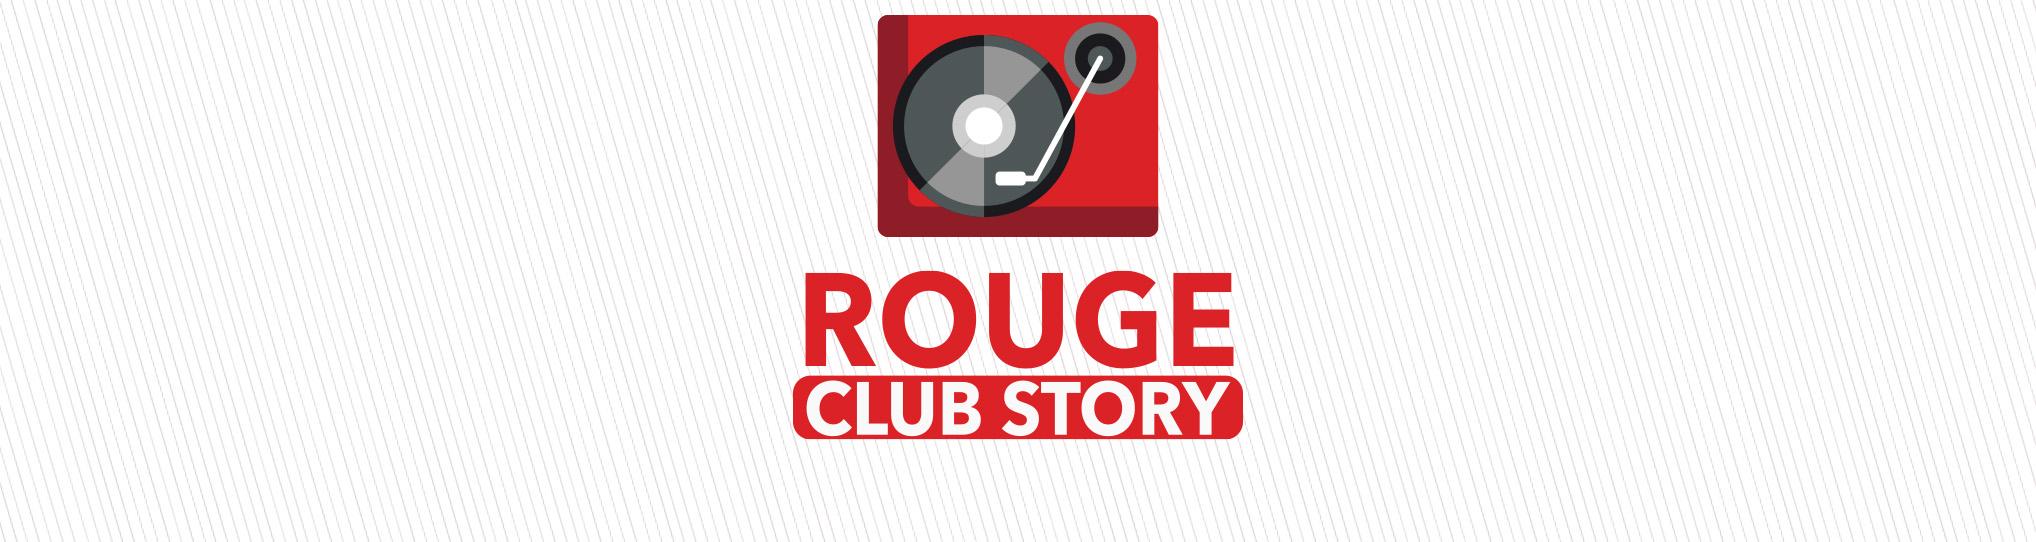 Rouge Club Story avec Sandra et Othello